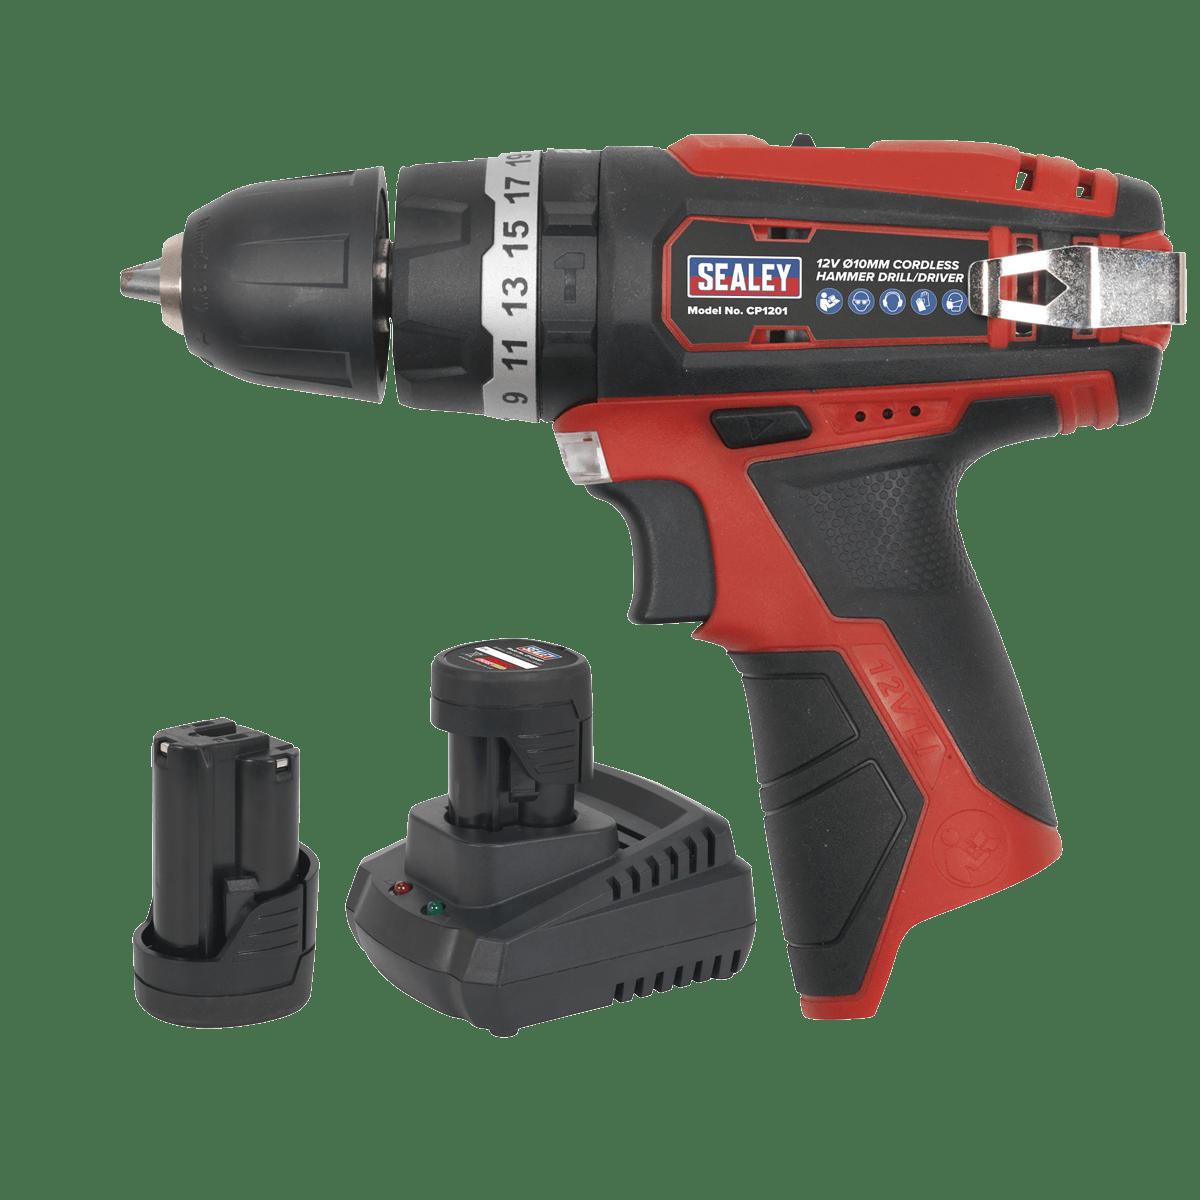 Sealey Hammer Drill/Driver Kit Ø10mm 12V Lithium-ion - 2 Batteries CP1201KIT